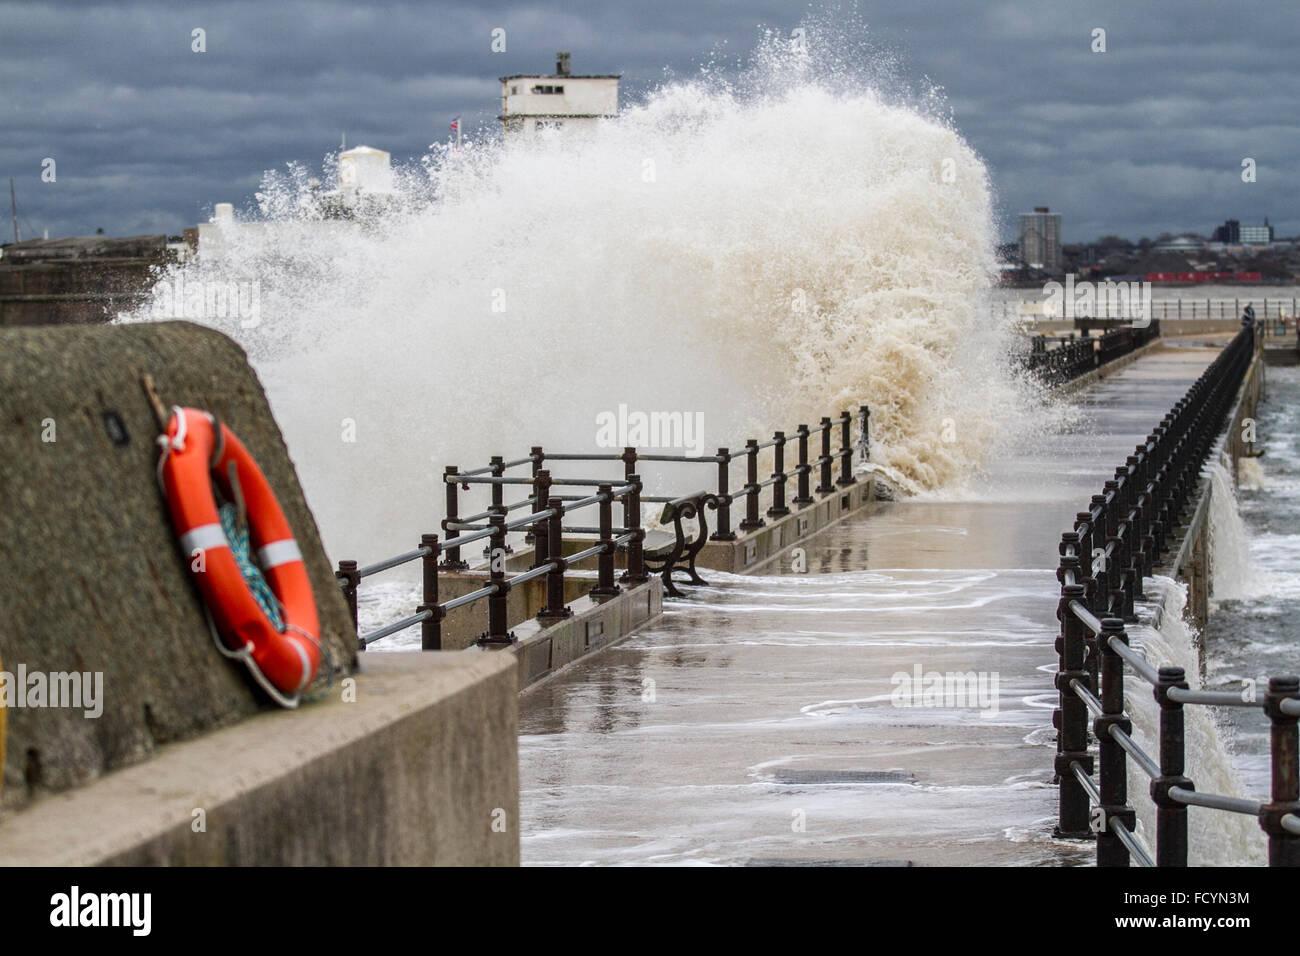 New Brighton, Birkenhead, Liverpool, UK. 26th January 2016. UK weather. High waves crash against the sea defences Stock Photo